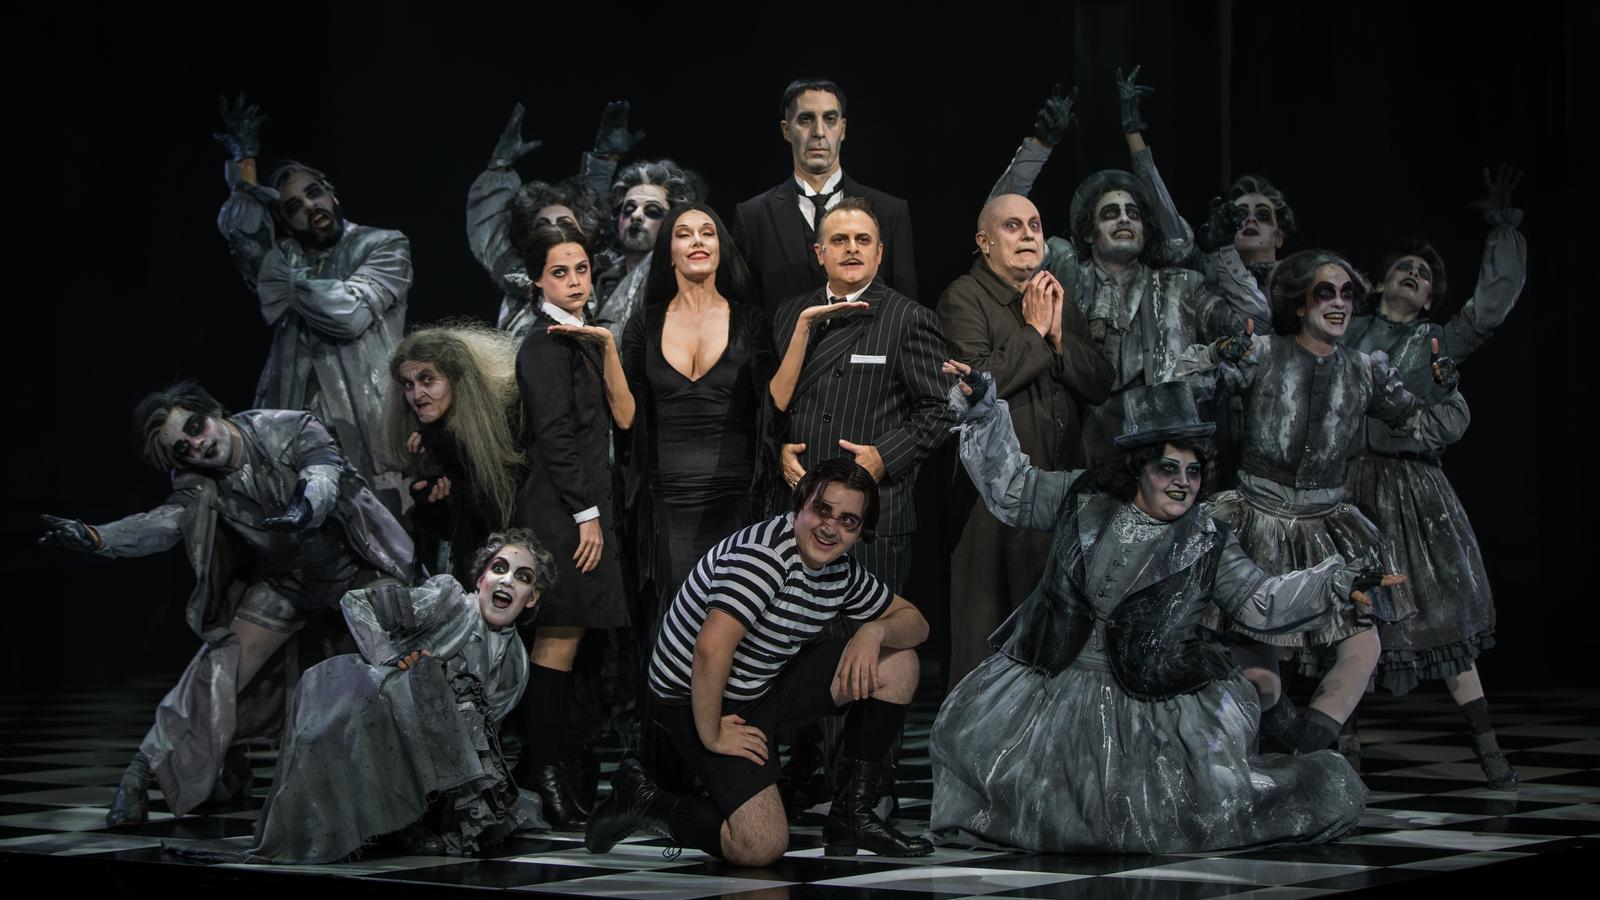 La Familia Addams arriba